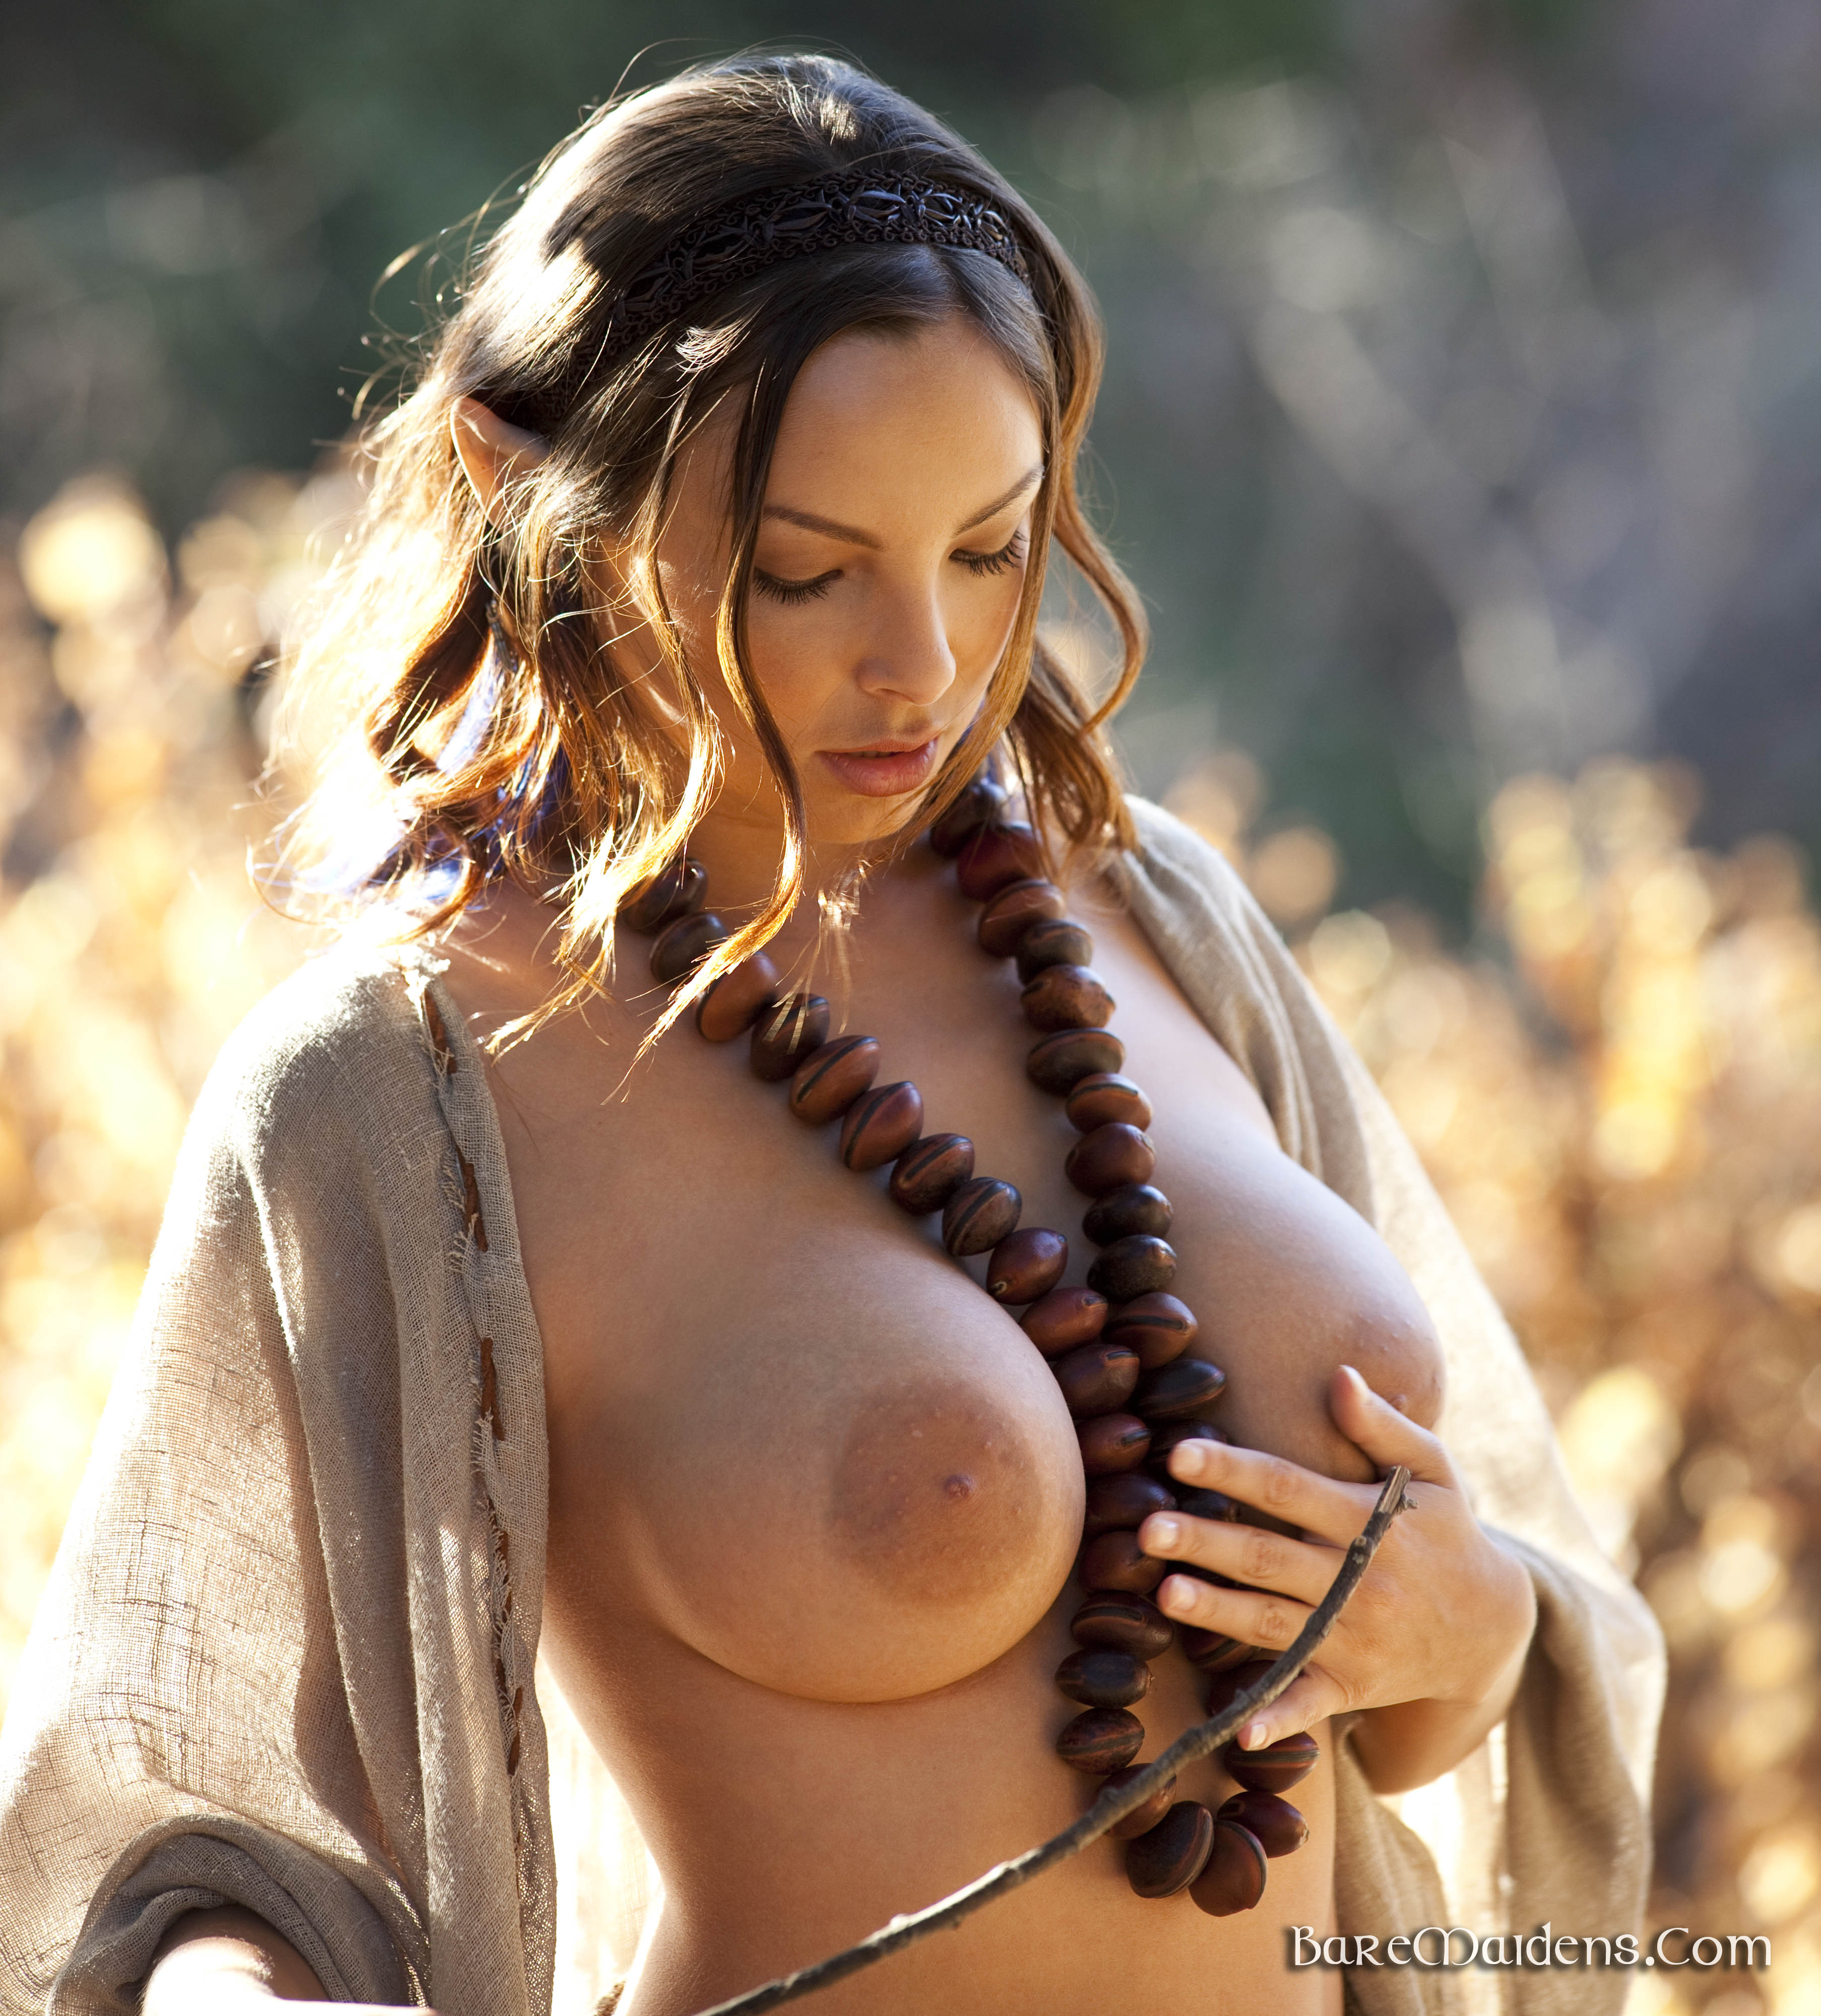 Handjob on nude beach